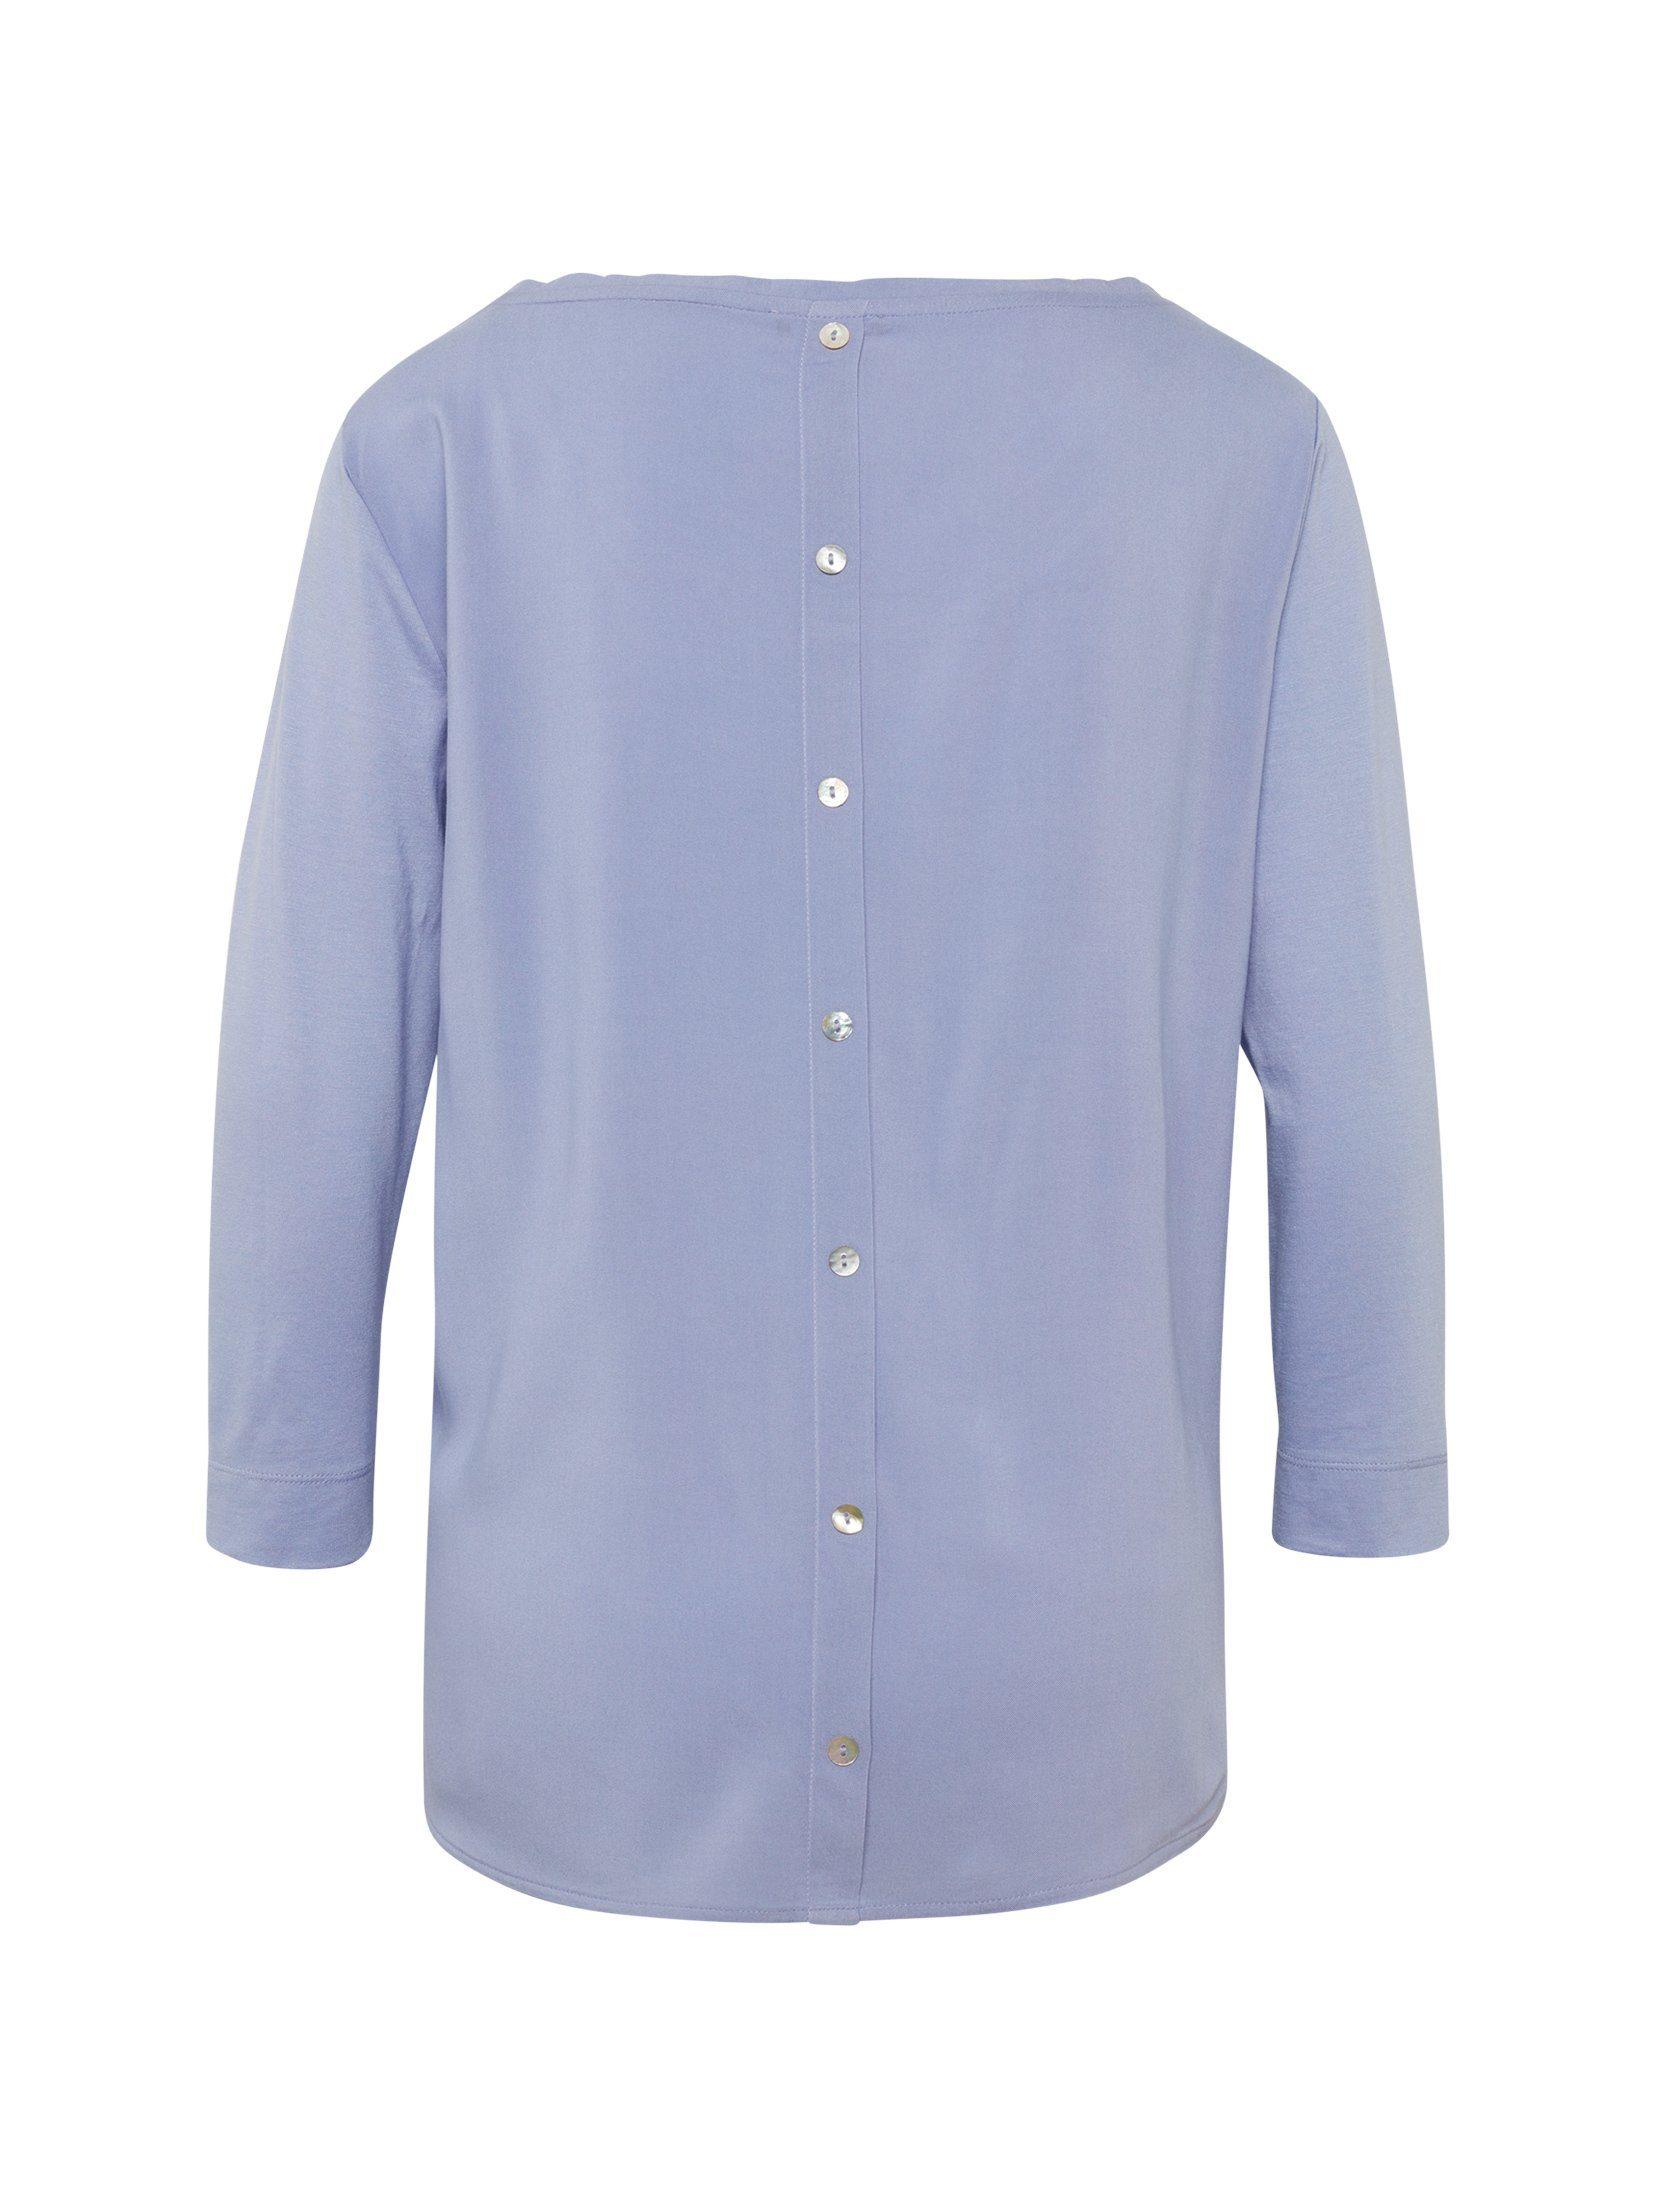 3 Im Materialmix« »shirt arm shirt Tailor Tom 4 wn0OPk